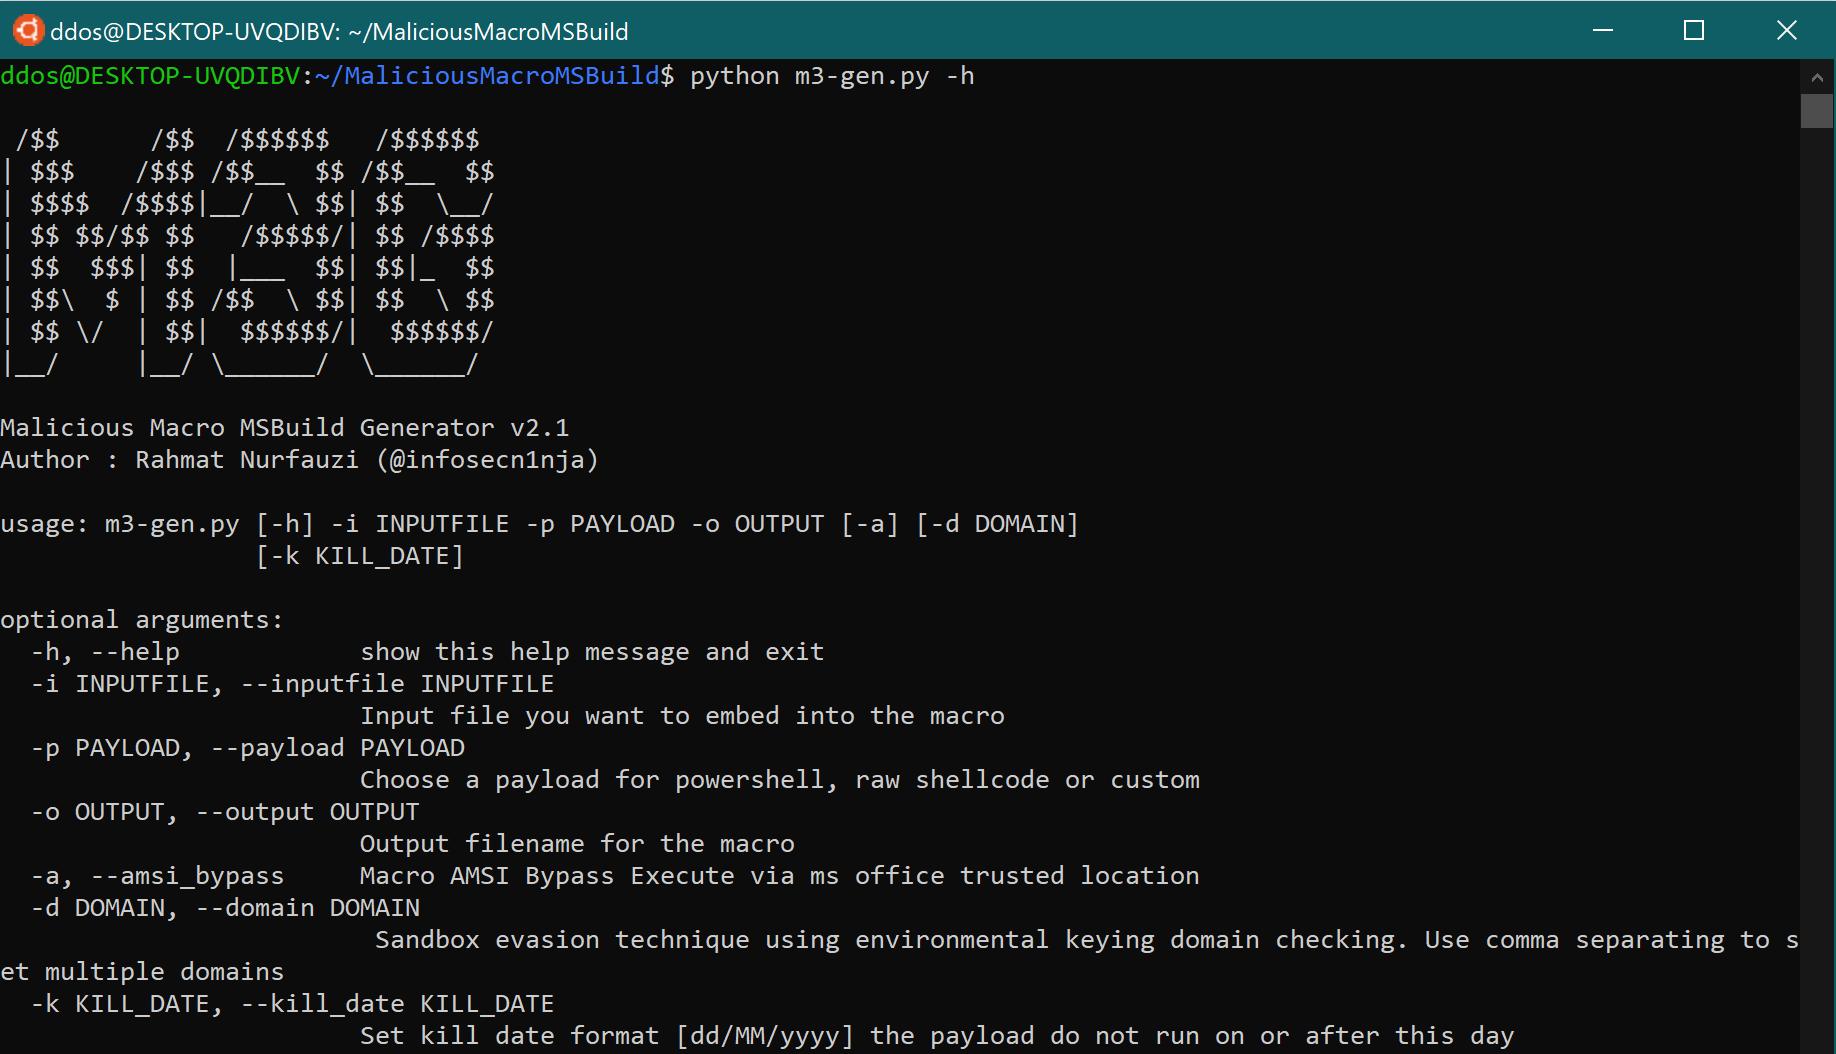 MaliciousMacroMSBuild: Generates Malicious Macro and Execute Powershell or Shellcode